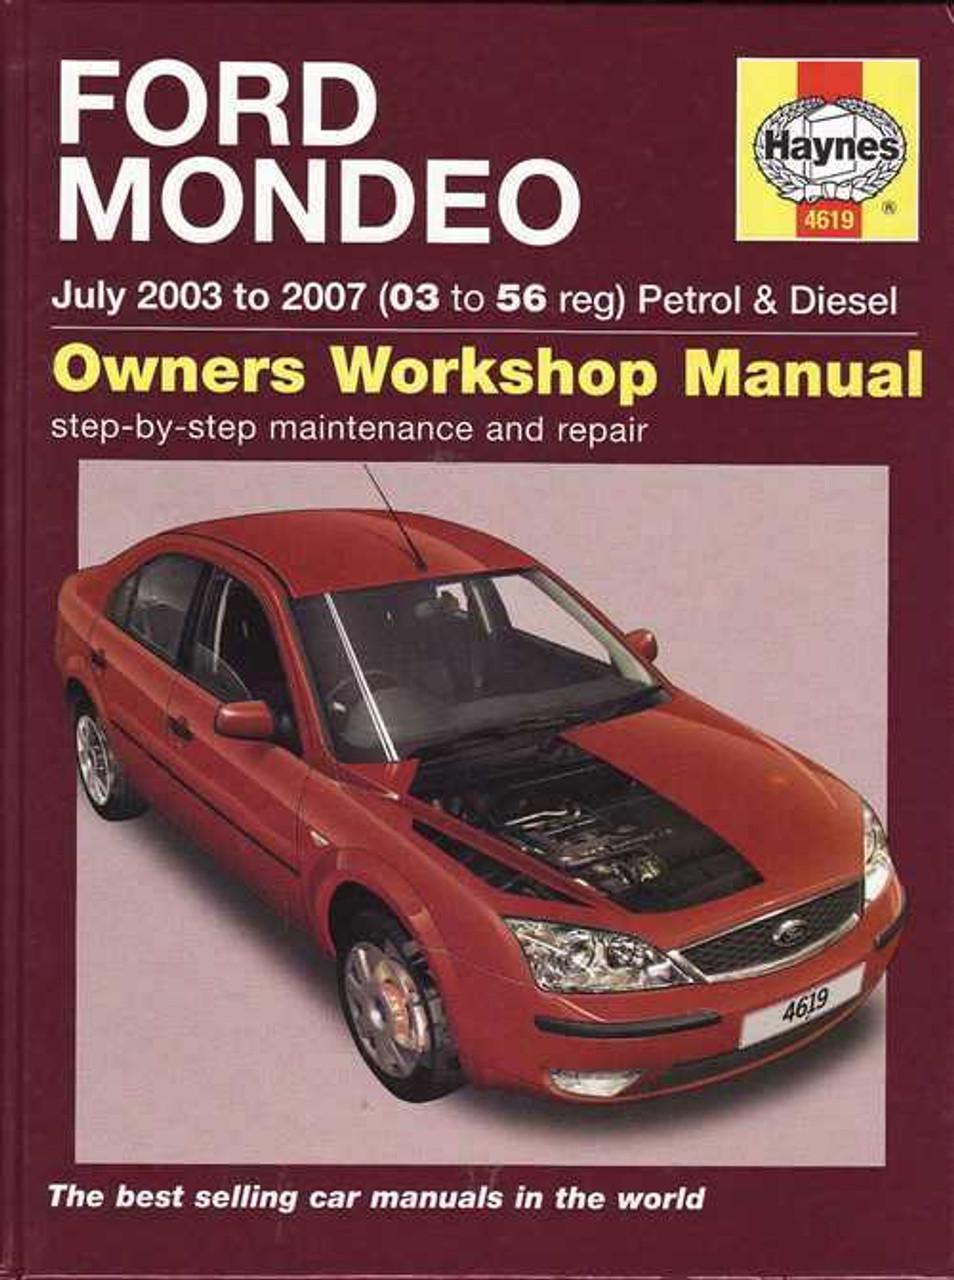 ford mondeo 2003 2007 workshop manual rh automotobookshop com au 1995 Ford Mondeo Ford Mondeo 2003 Lock Pin